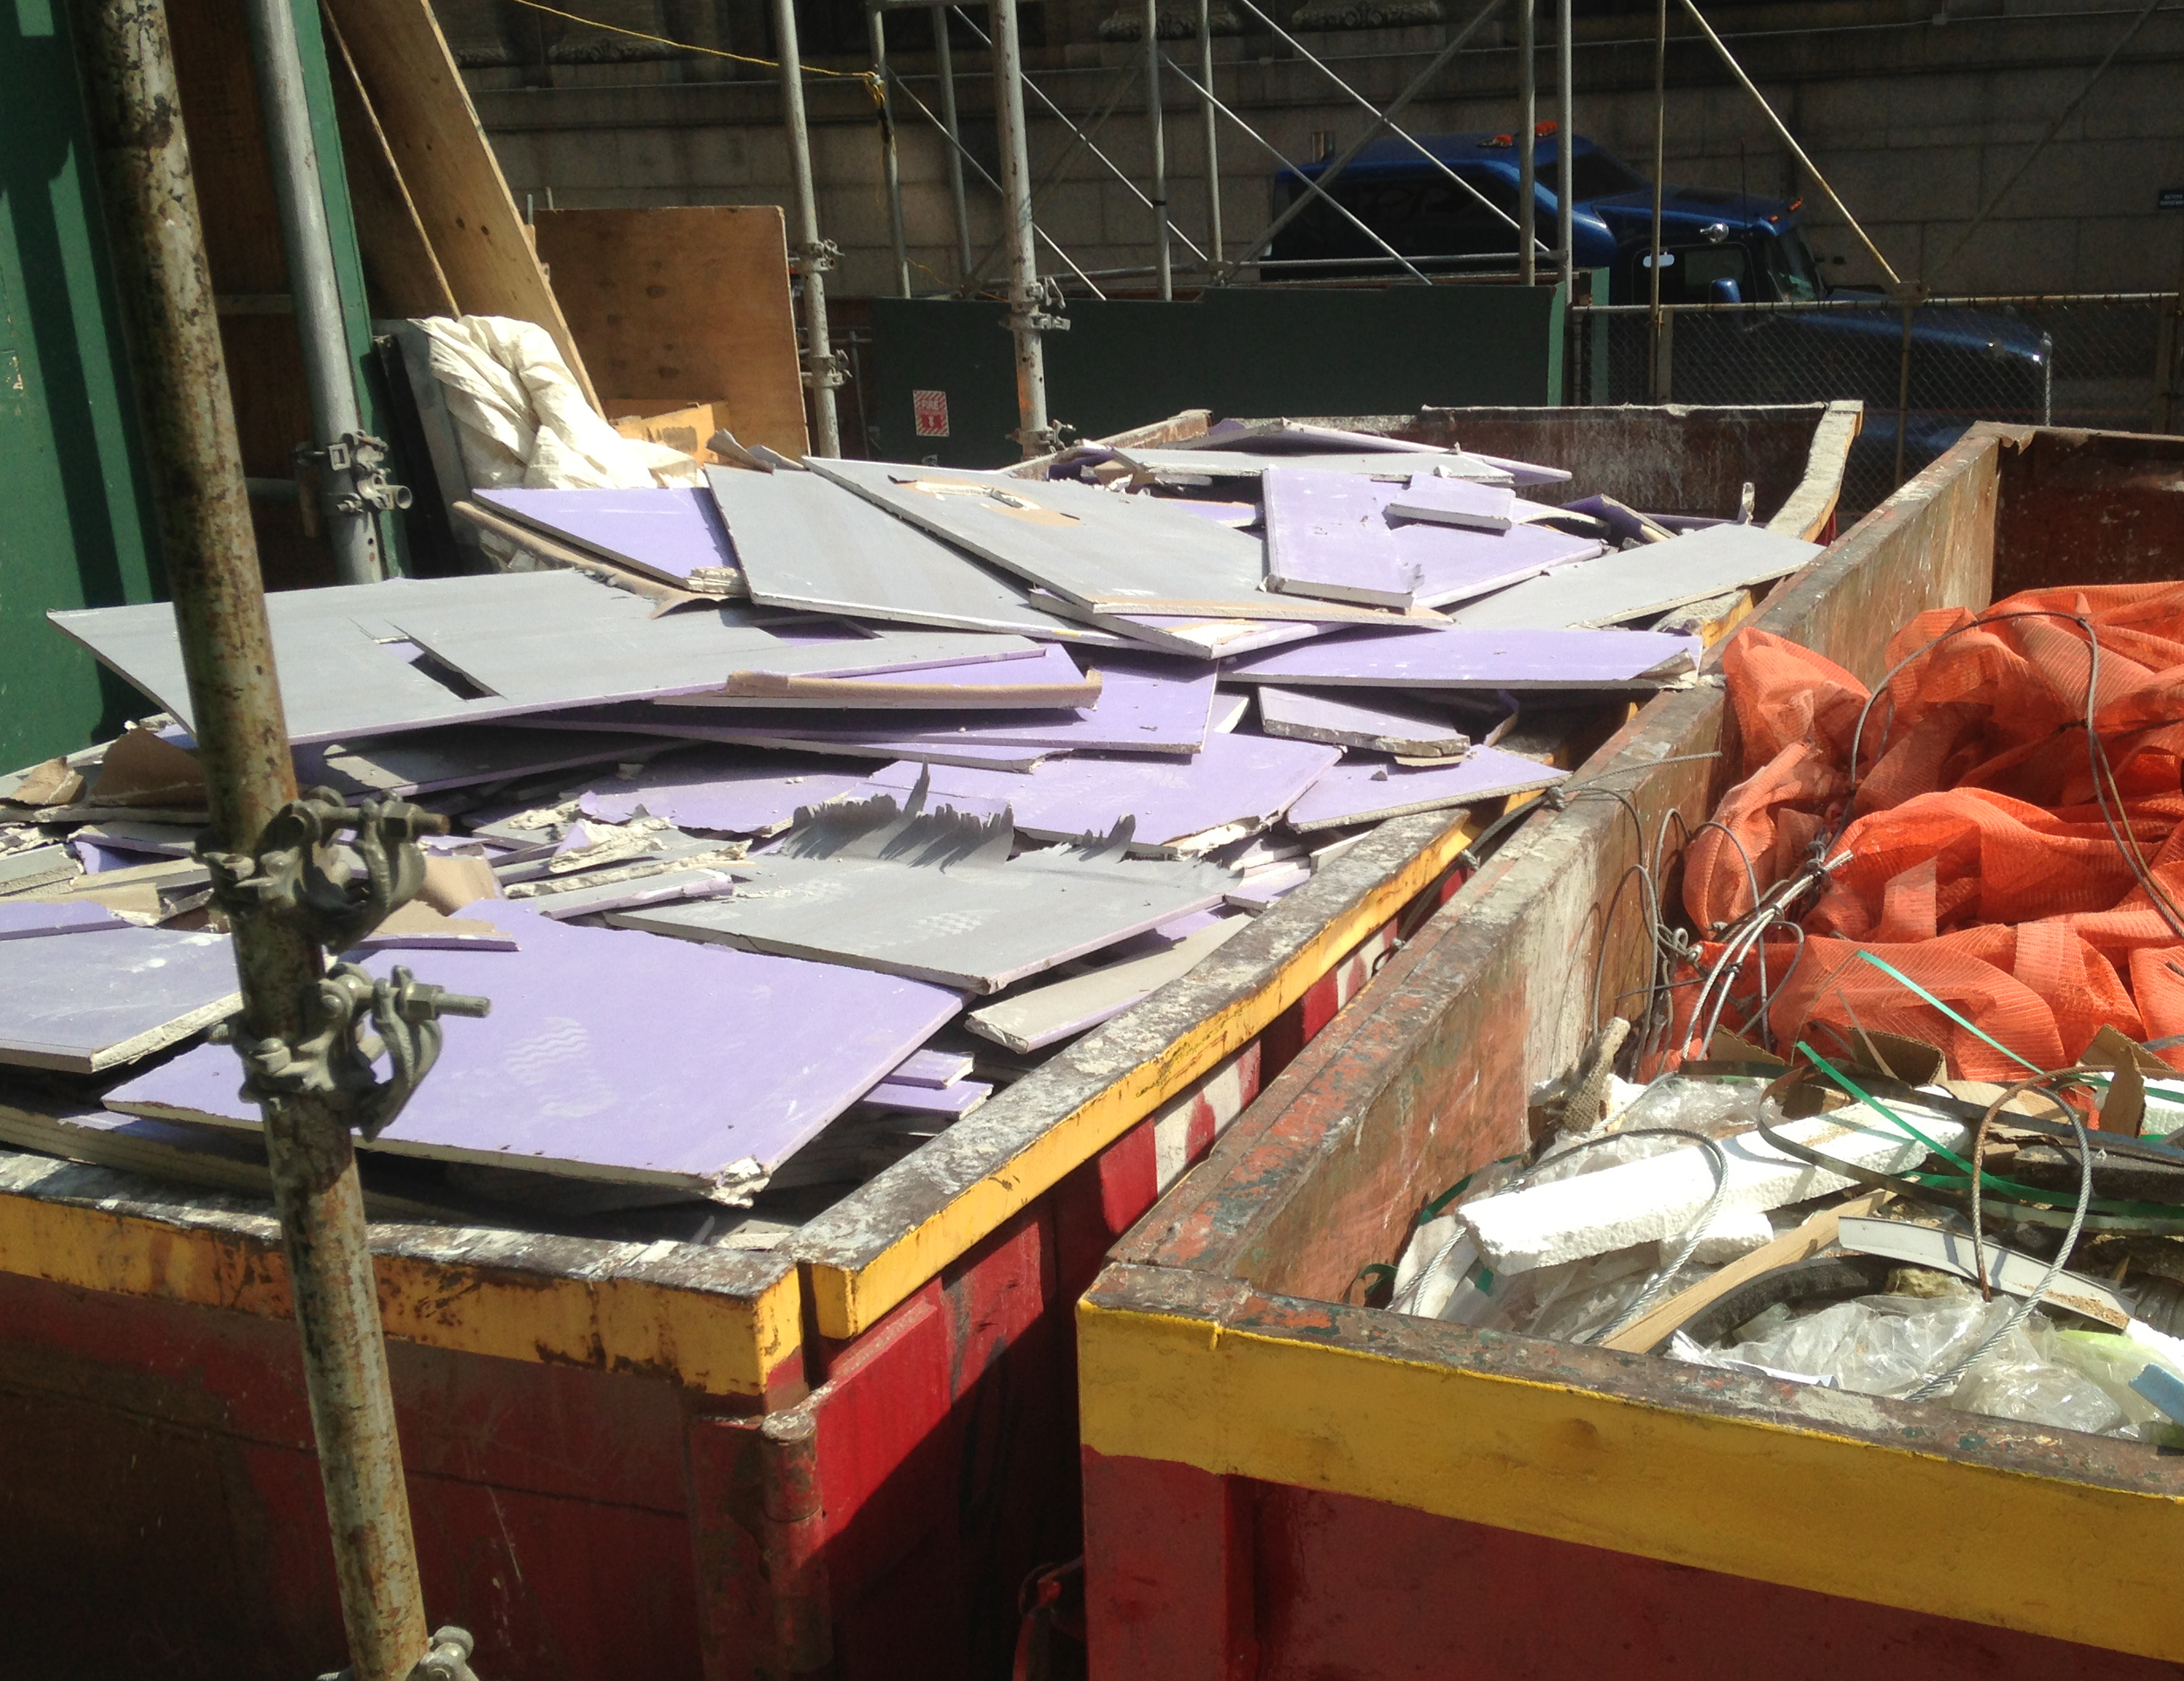 Maximize reuse - Source separating gypsum debris minimizes construction & demolition debris cross-contamination, and generation of non-recyclable fines.